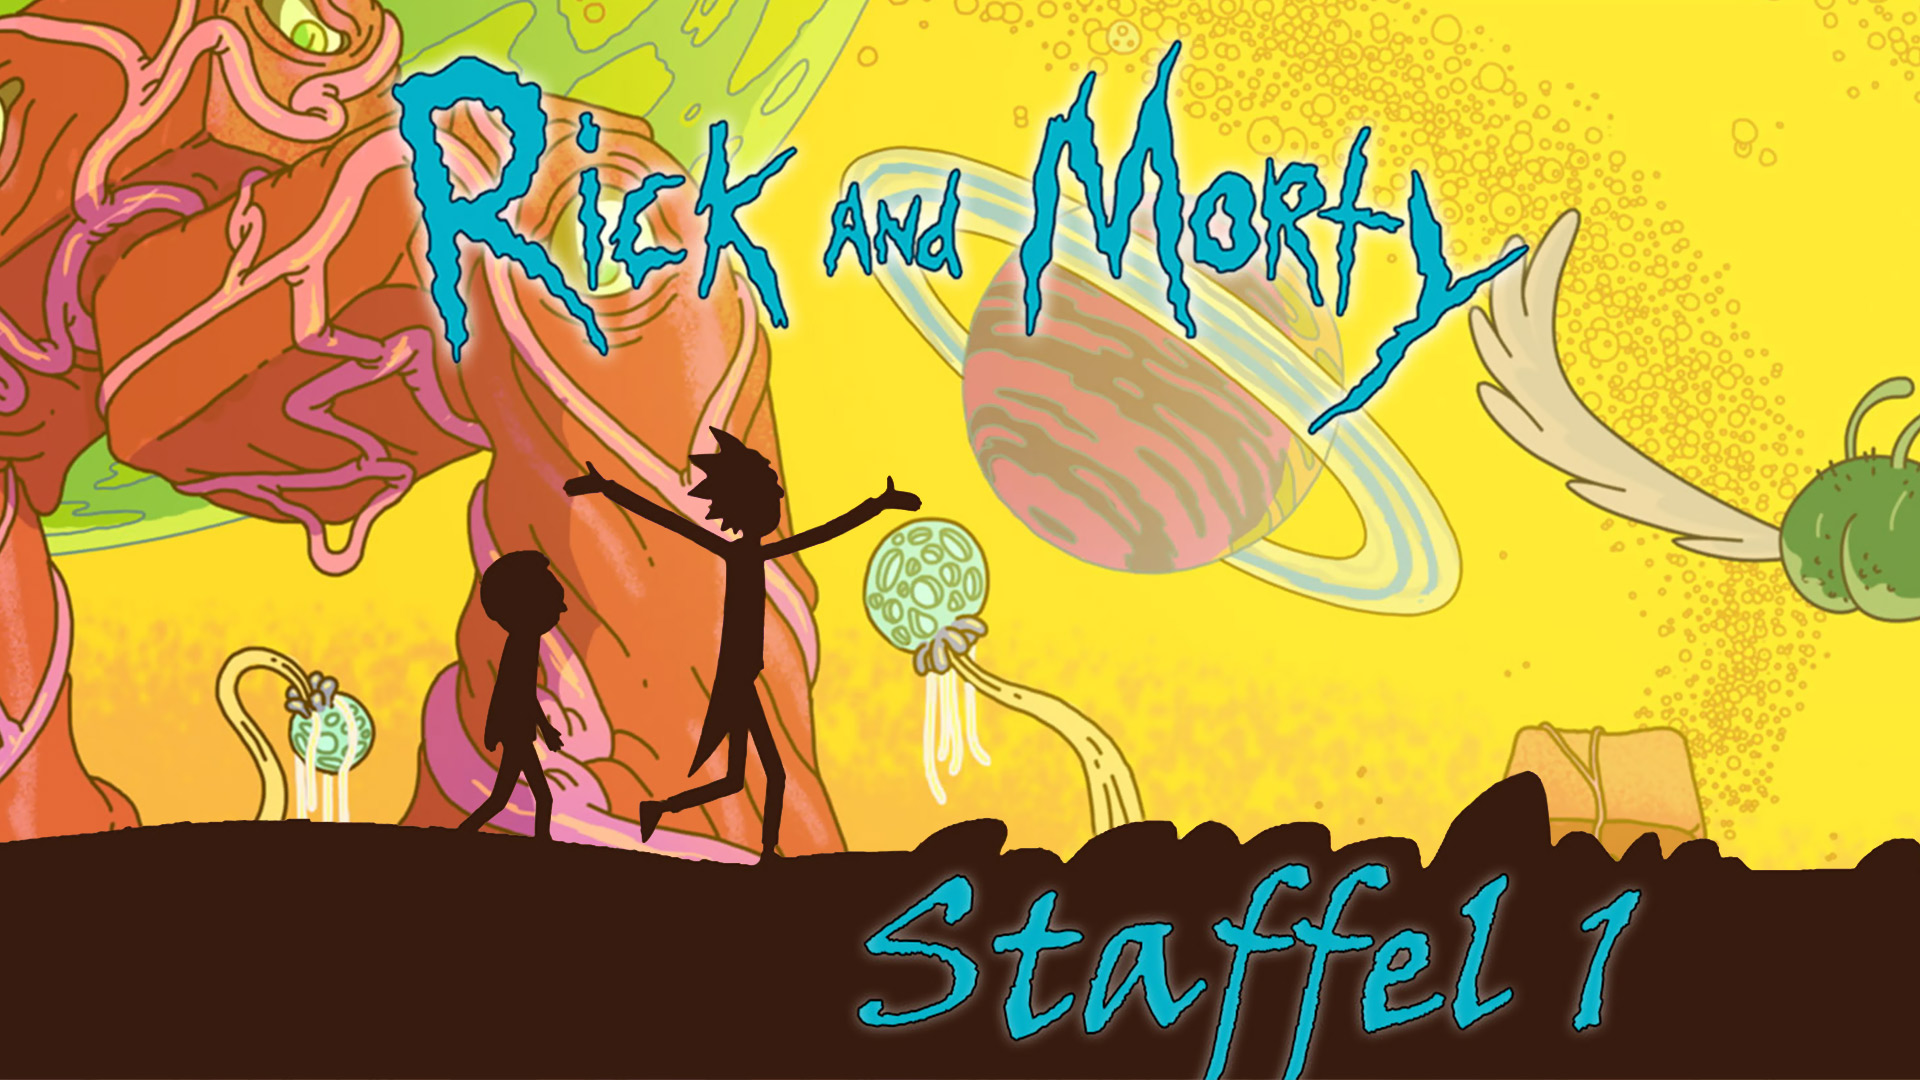 Rick and Morty - Staffel 1 [dt./OV]